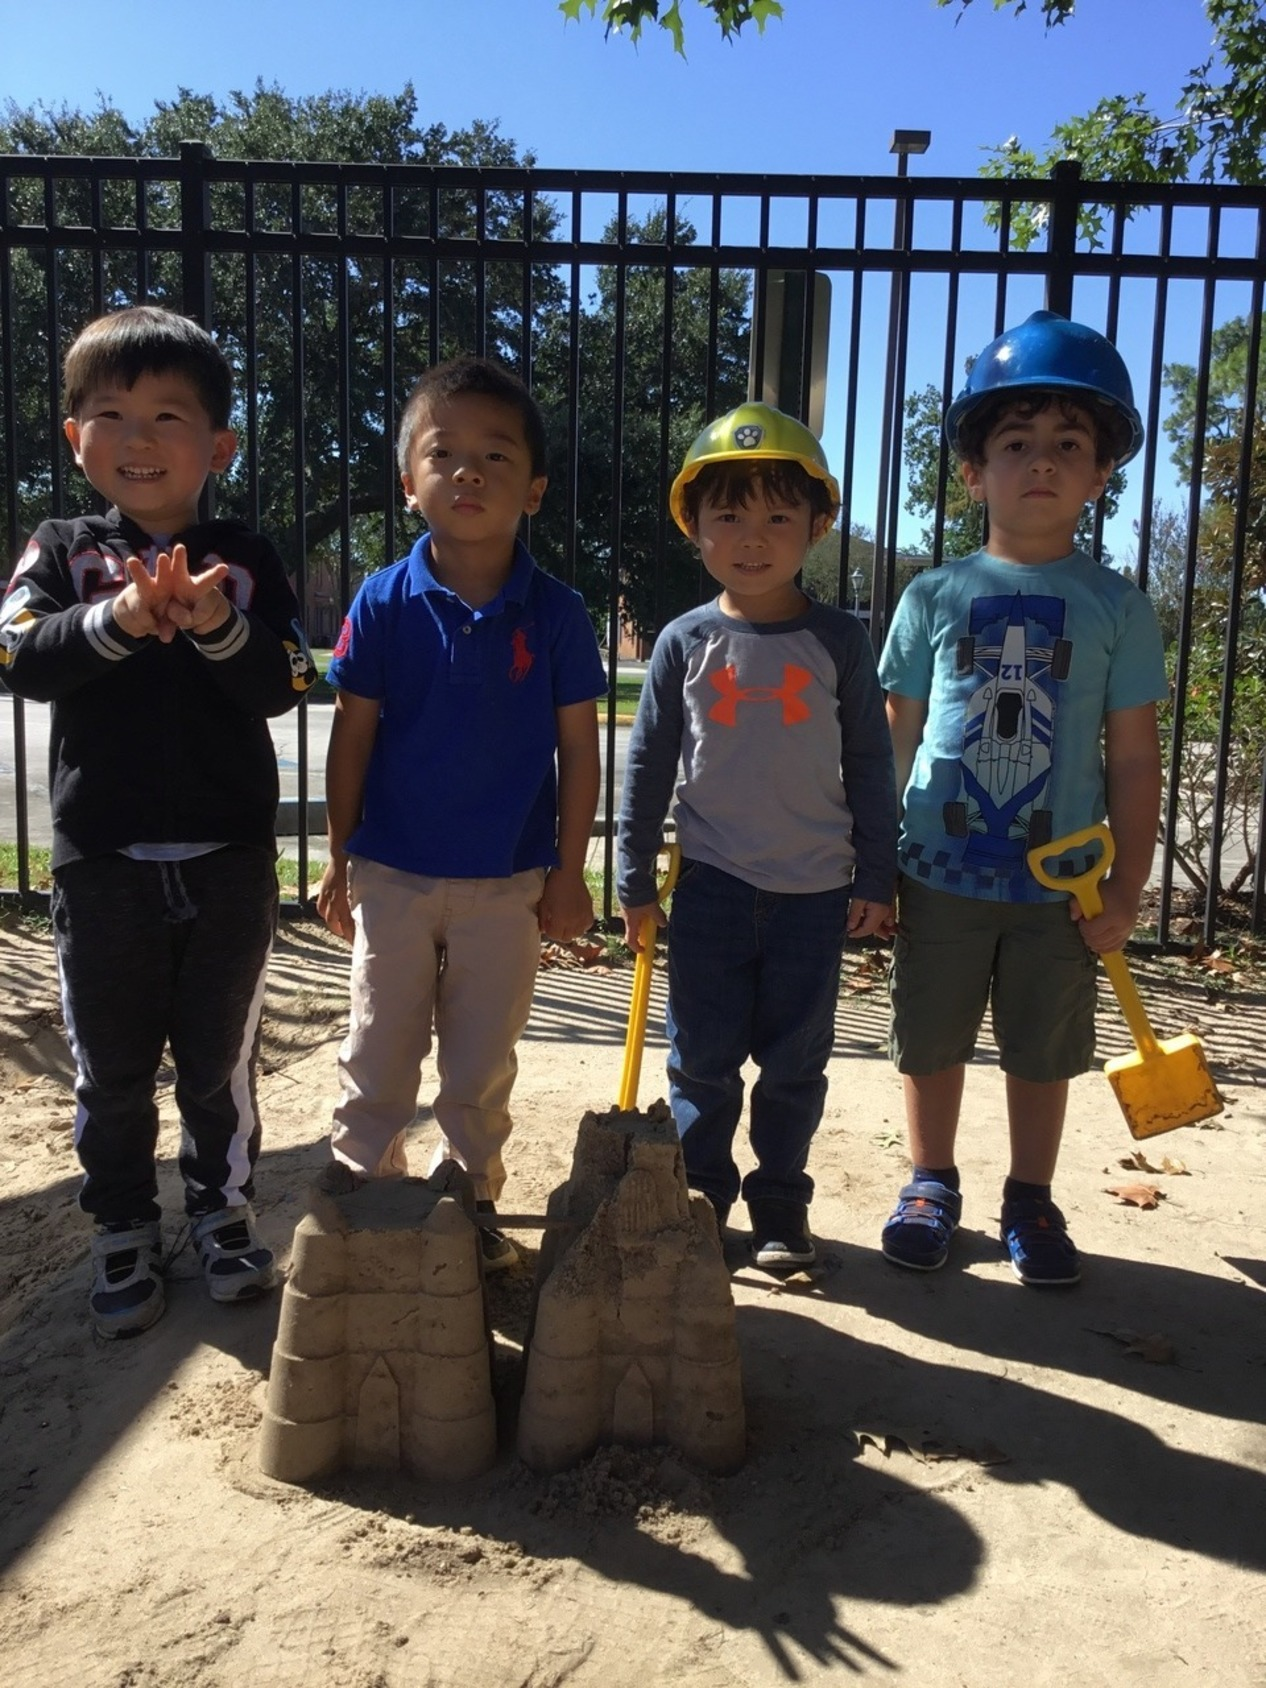 4 construction worker boys